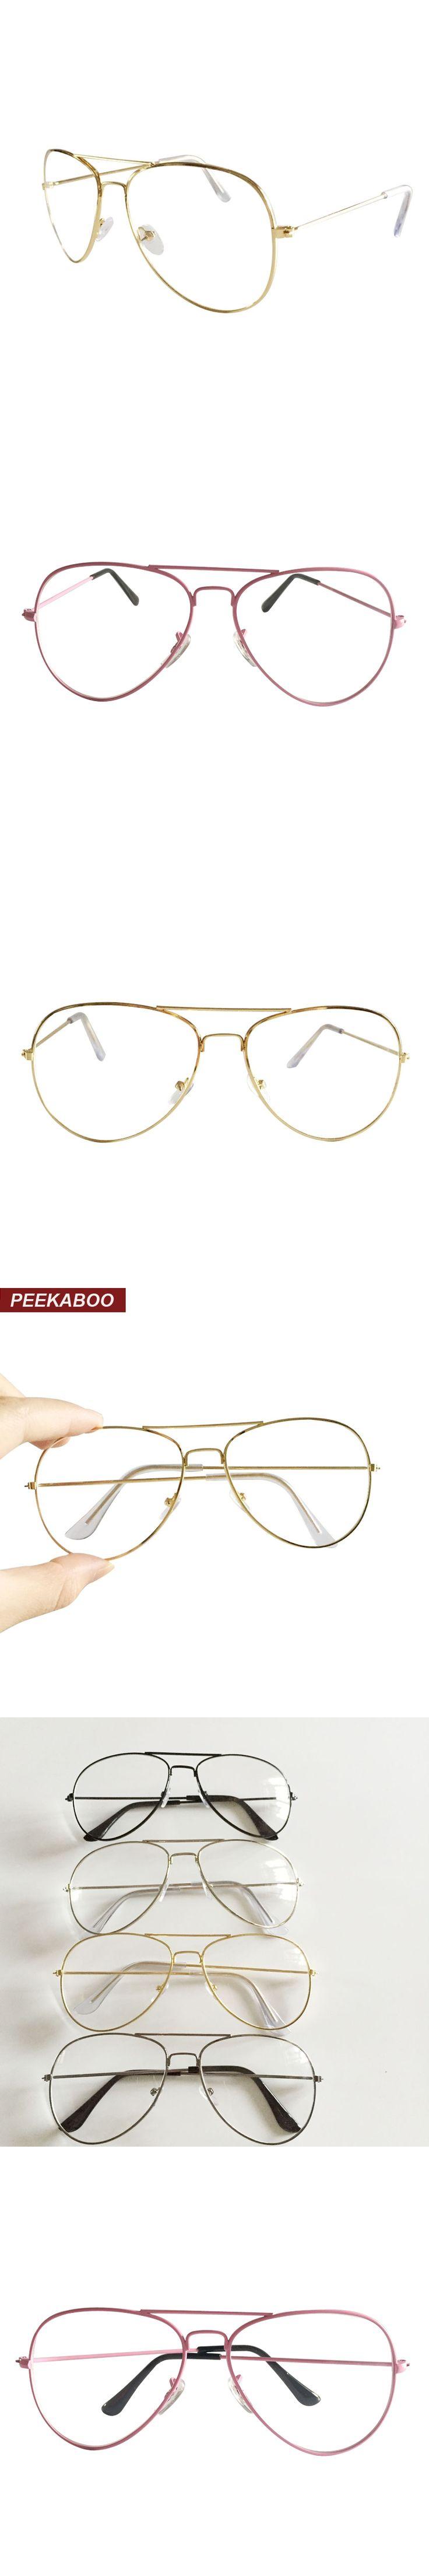 peekaboo new gold rimmed glasses frame men brand flat top metal alloy discount cheap eyeglass frames - Discount Eyeglasses Frames